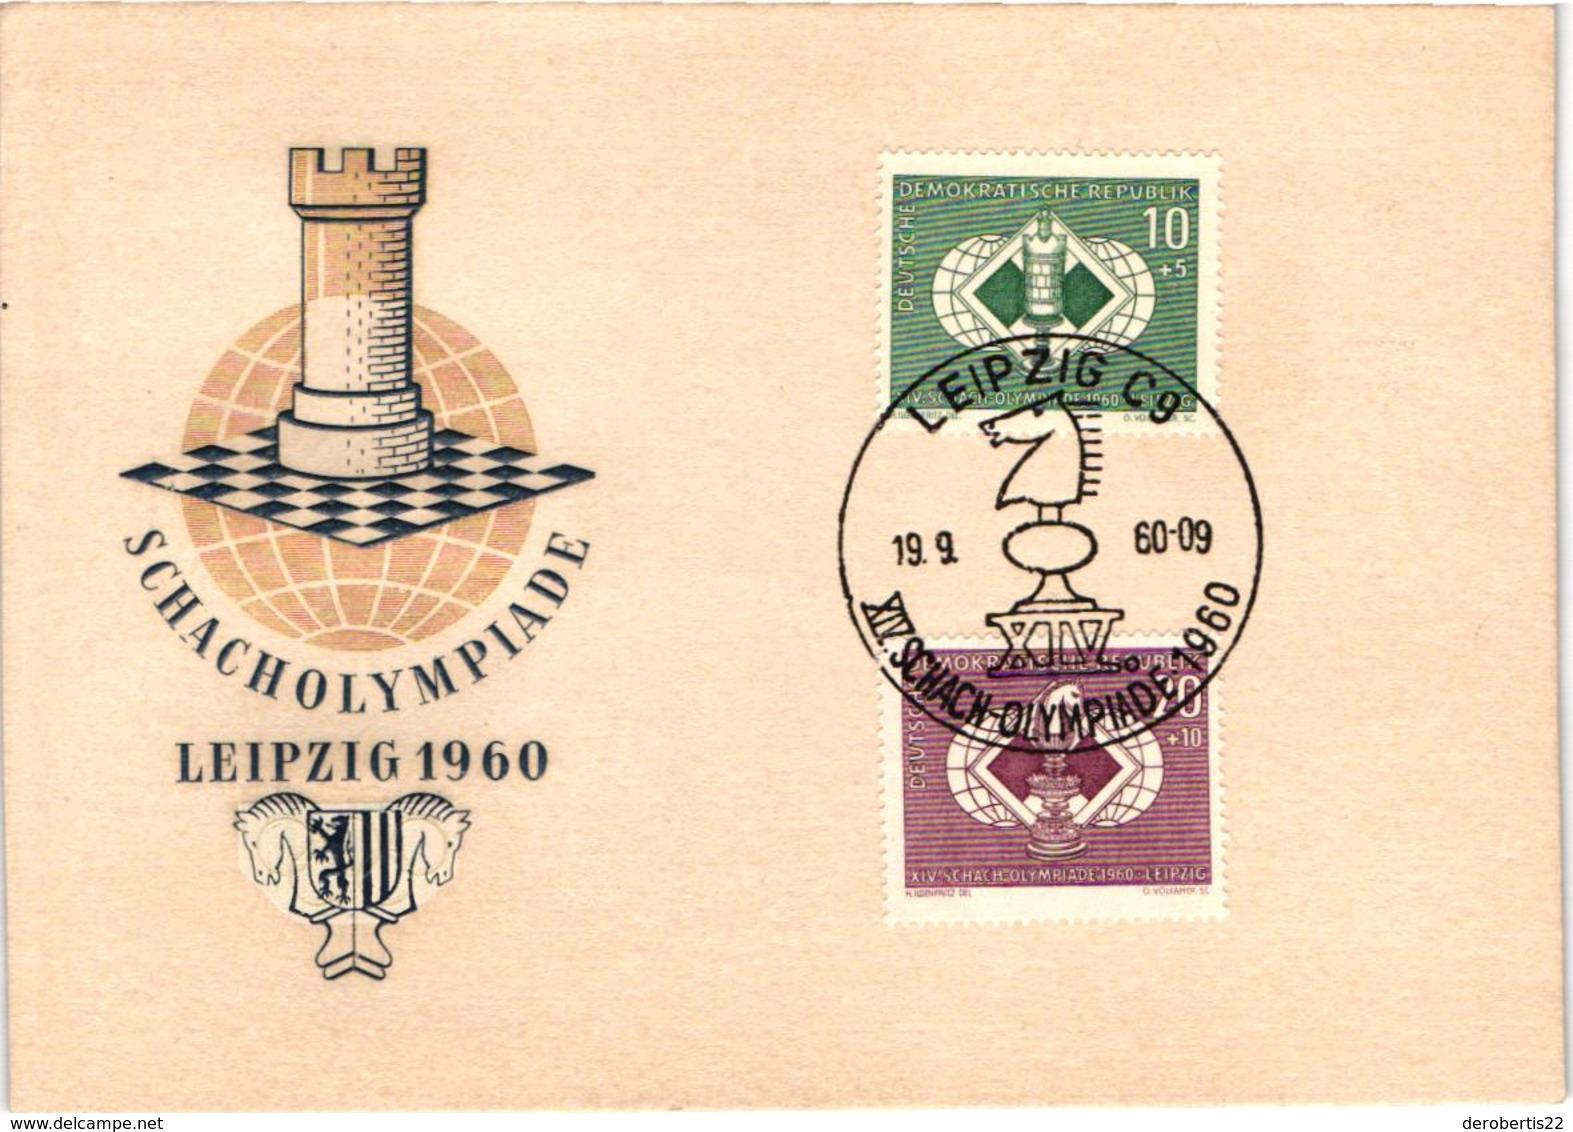 Chess Schach Echecs Ajedrez - East Germany. Leipzig 1960 14th Chess Olympiad - Souvenir Card CKM 78c - Scacchi